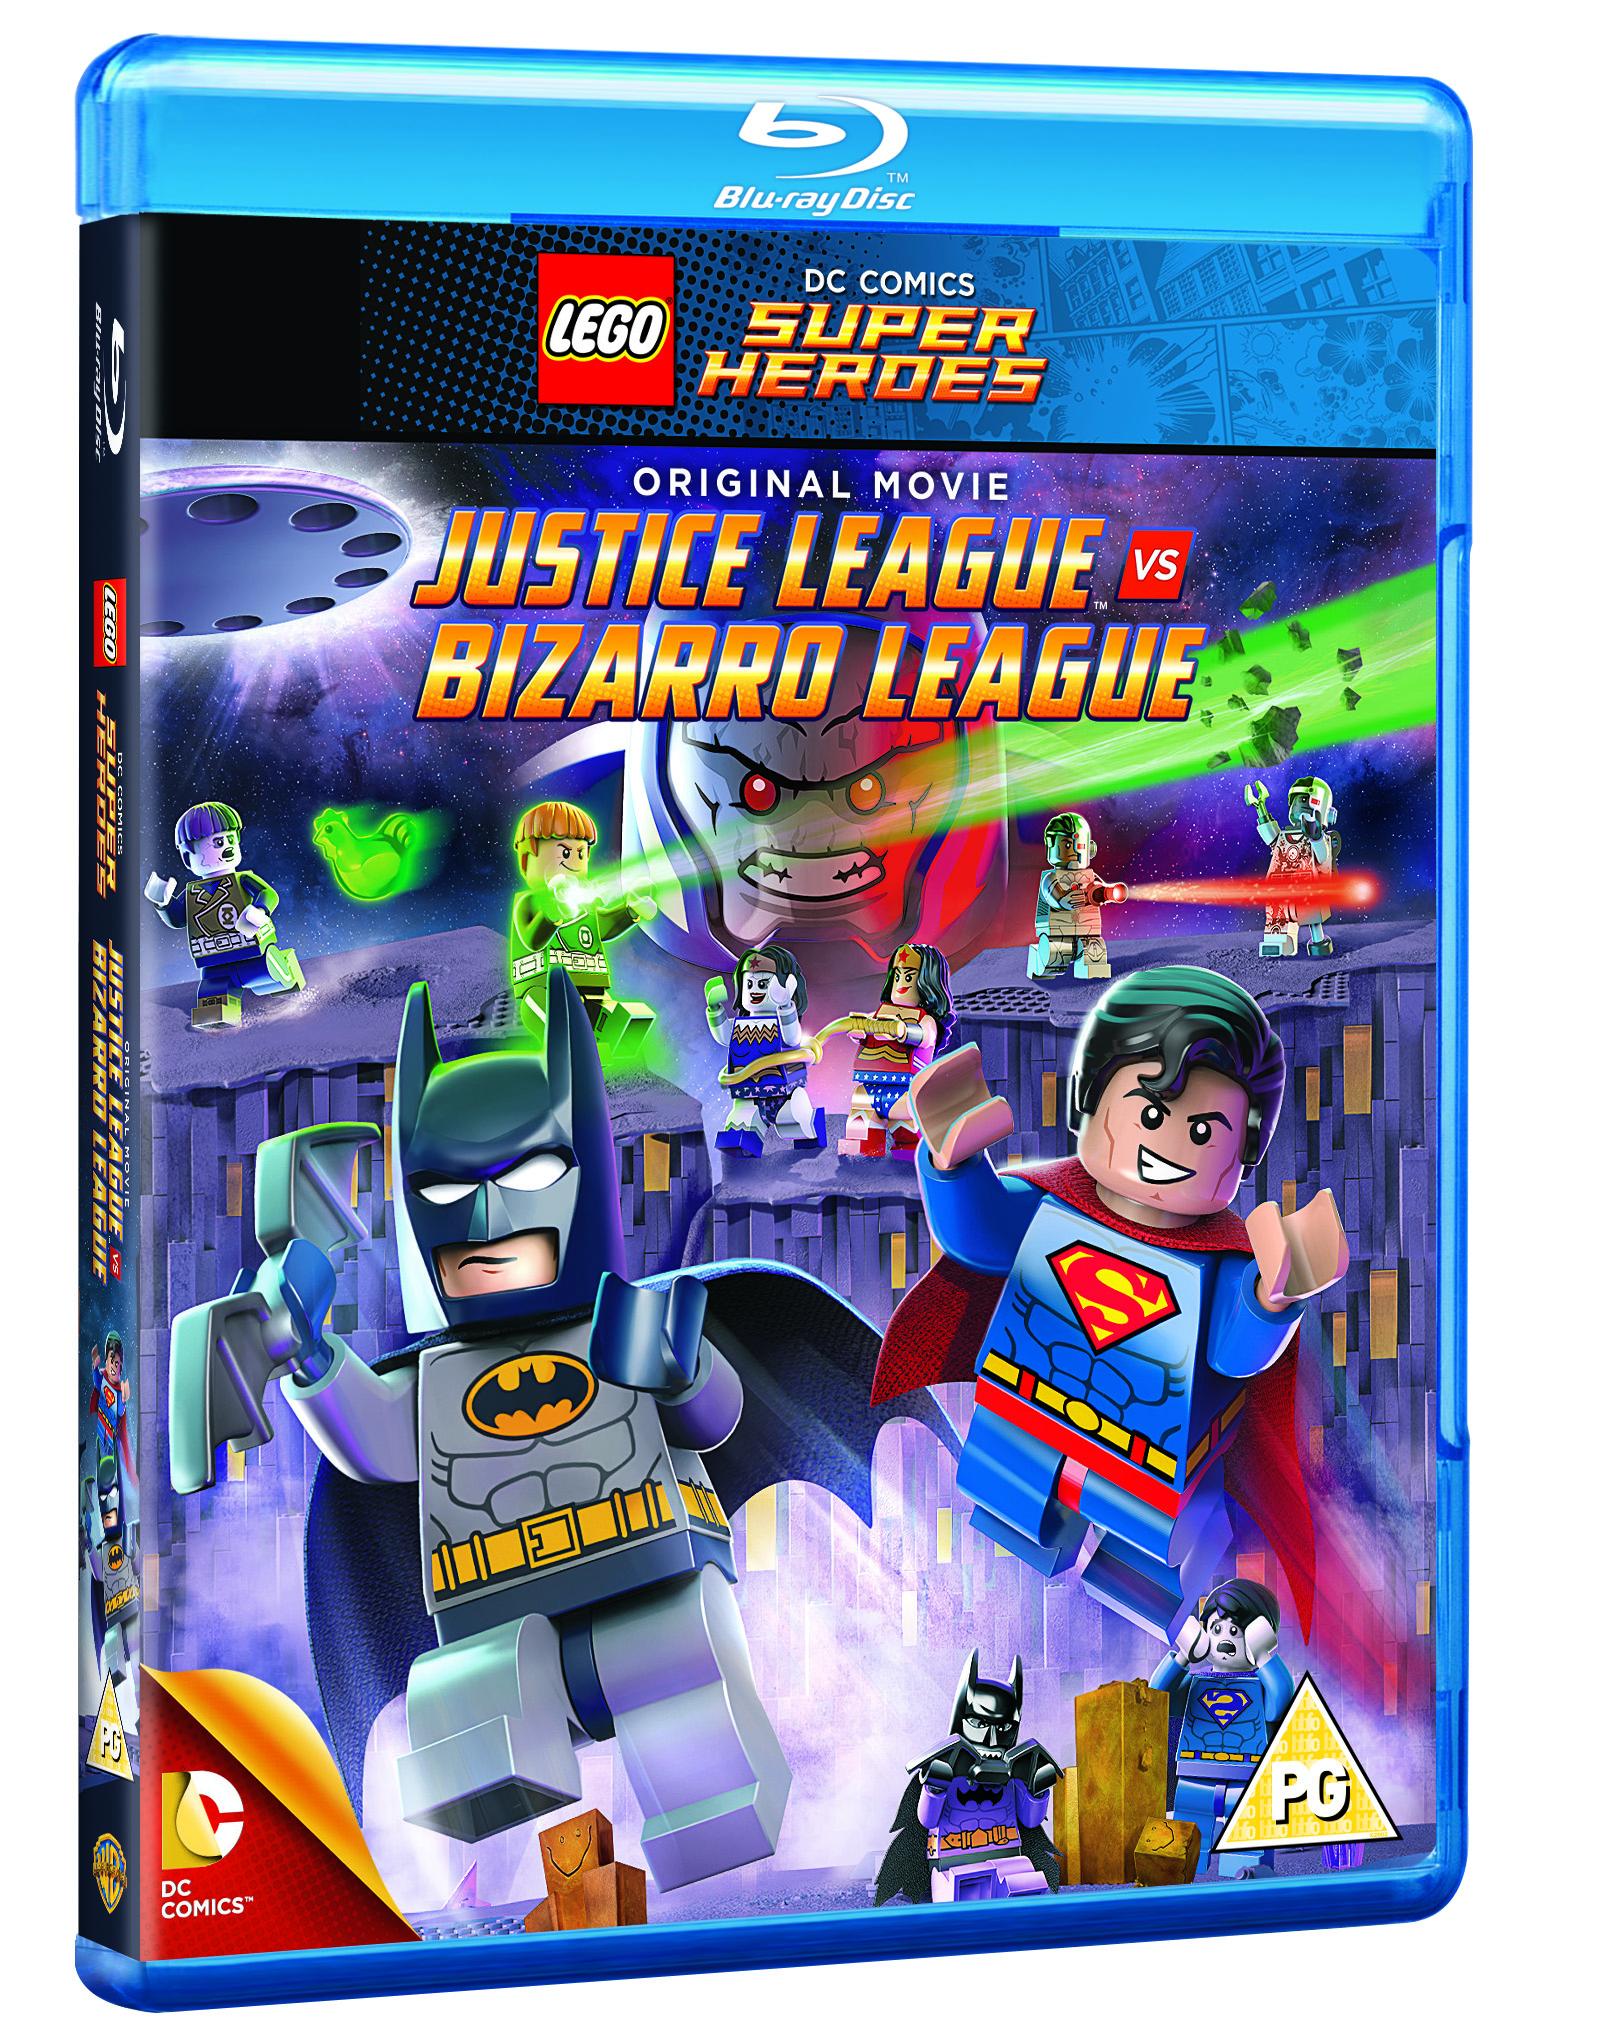 Lego: Justice League Vs Bizarro League  (BLU-RAY)